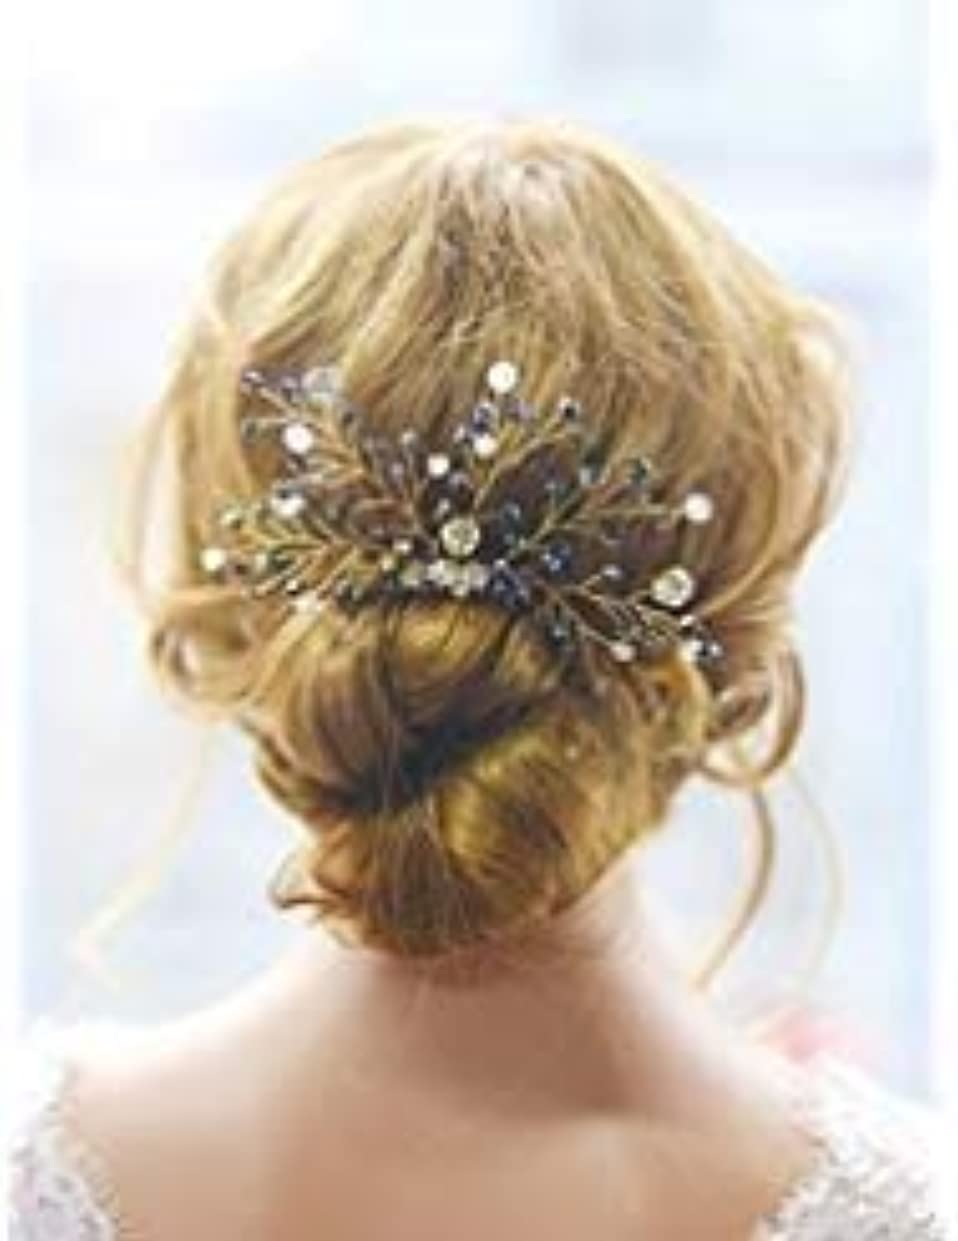 FXmimior Bridal Black Vintage Wedding Party Crystal Rhinestone Vintage Hair Comb Hair Accessories [並行輸入品]